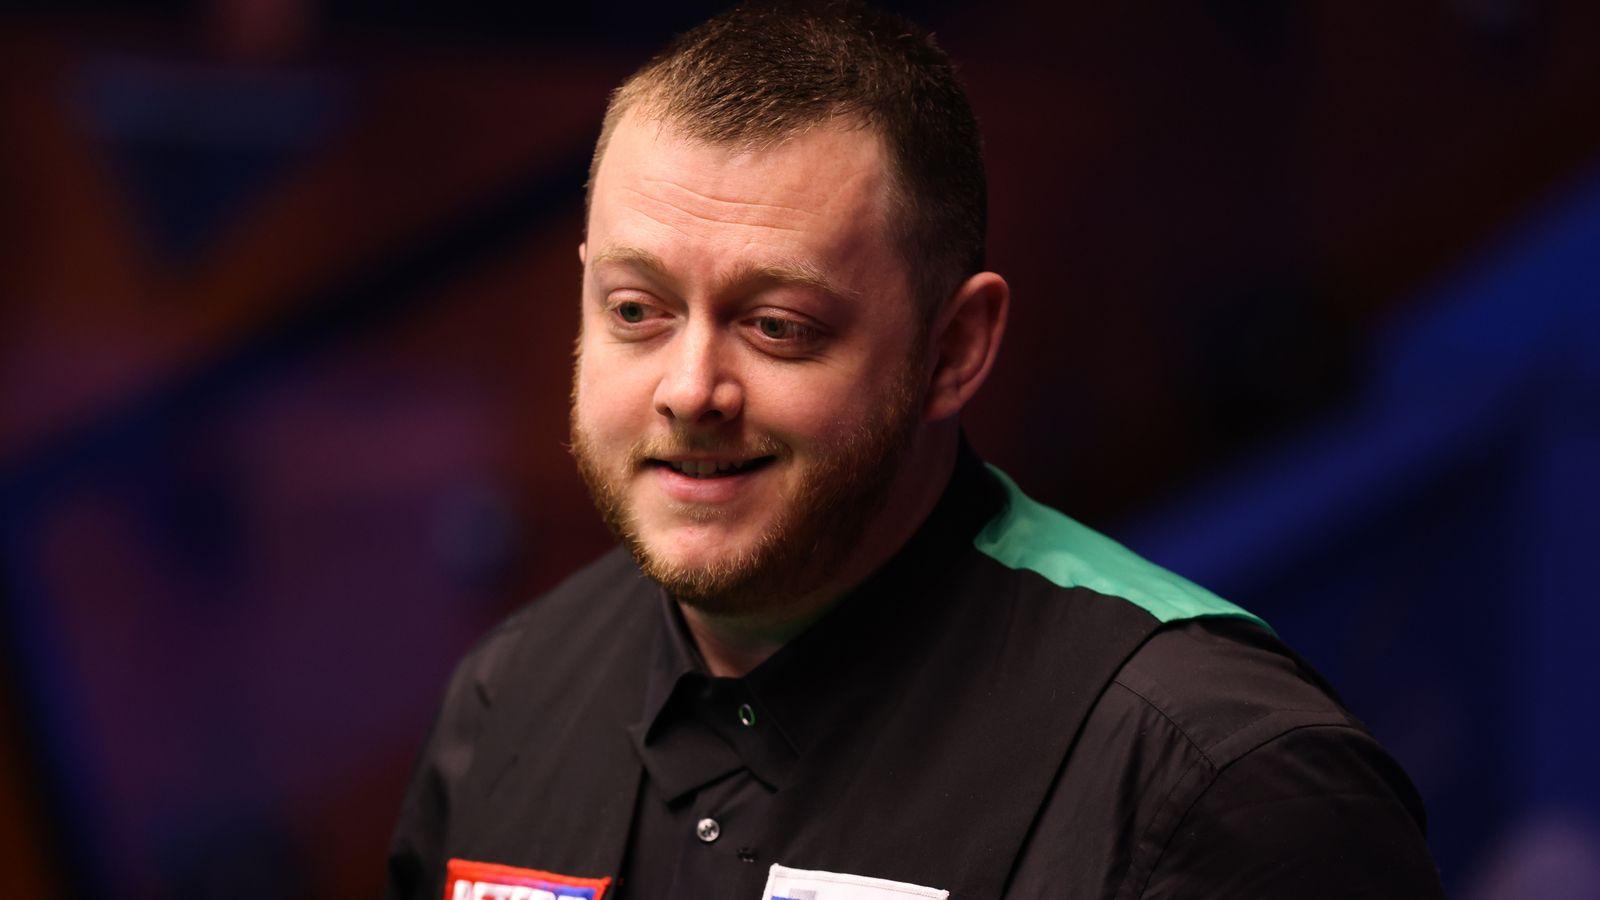 Mark Allen wins maiden Northern Ireland Open title with victory against John Higgins